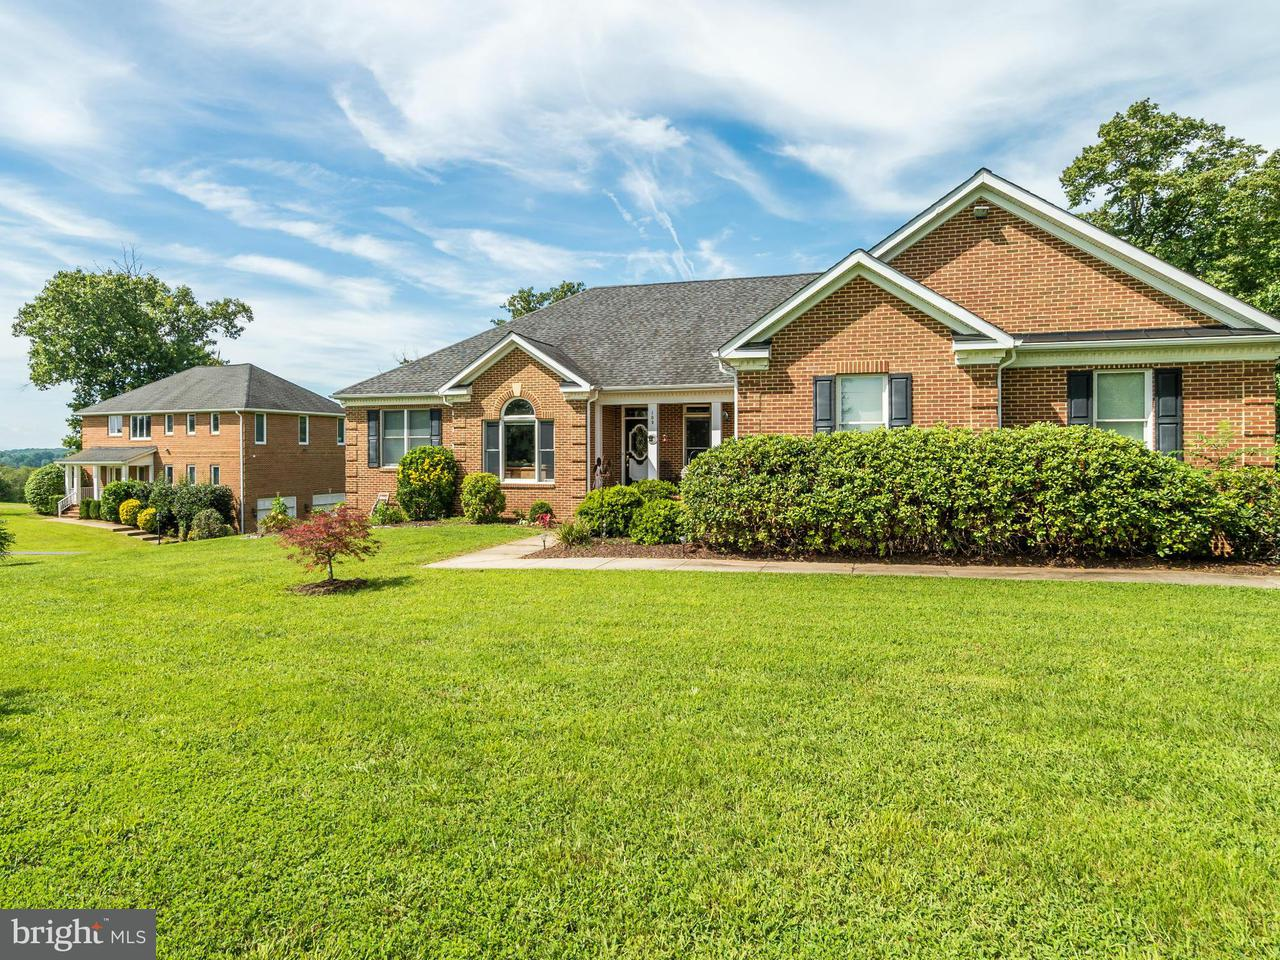 Single Family for Sale at 109 Arrington Mountain Rd Haywood, Virginia 22722 United States